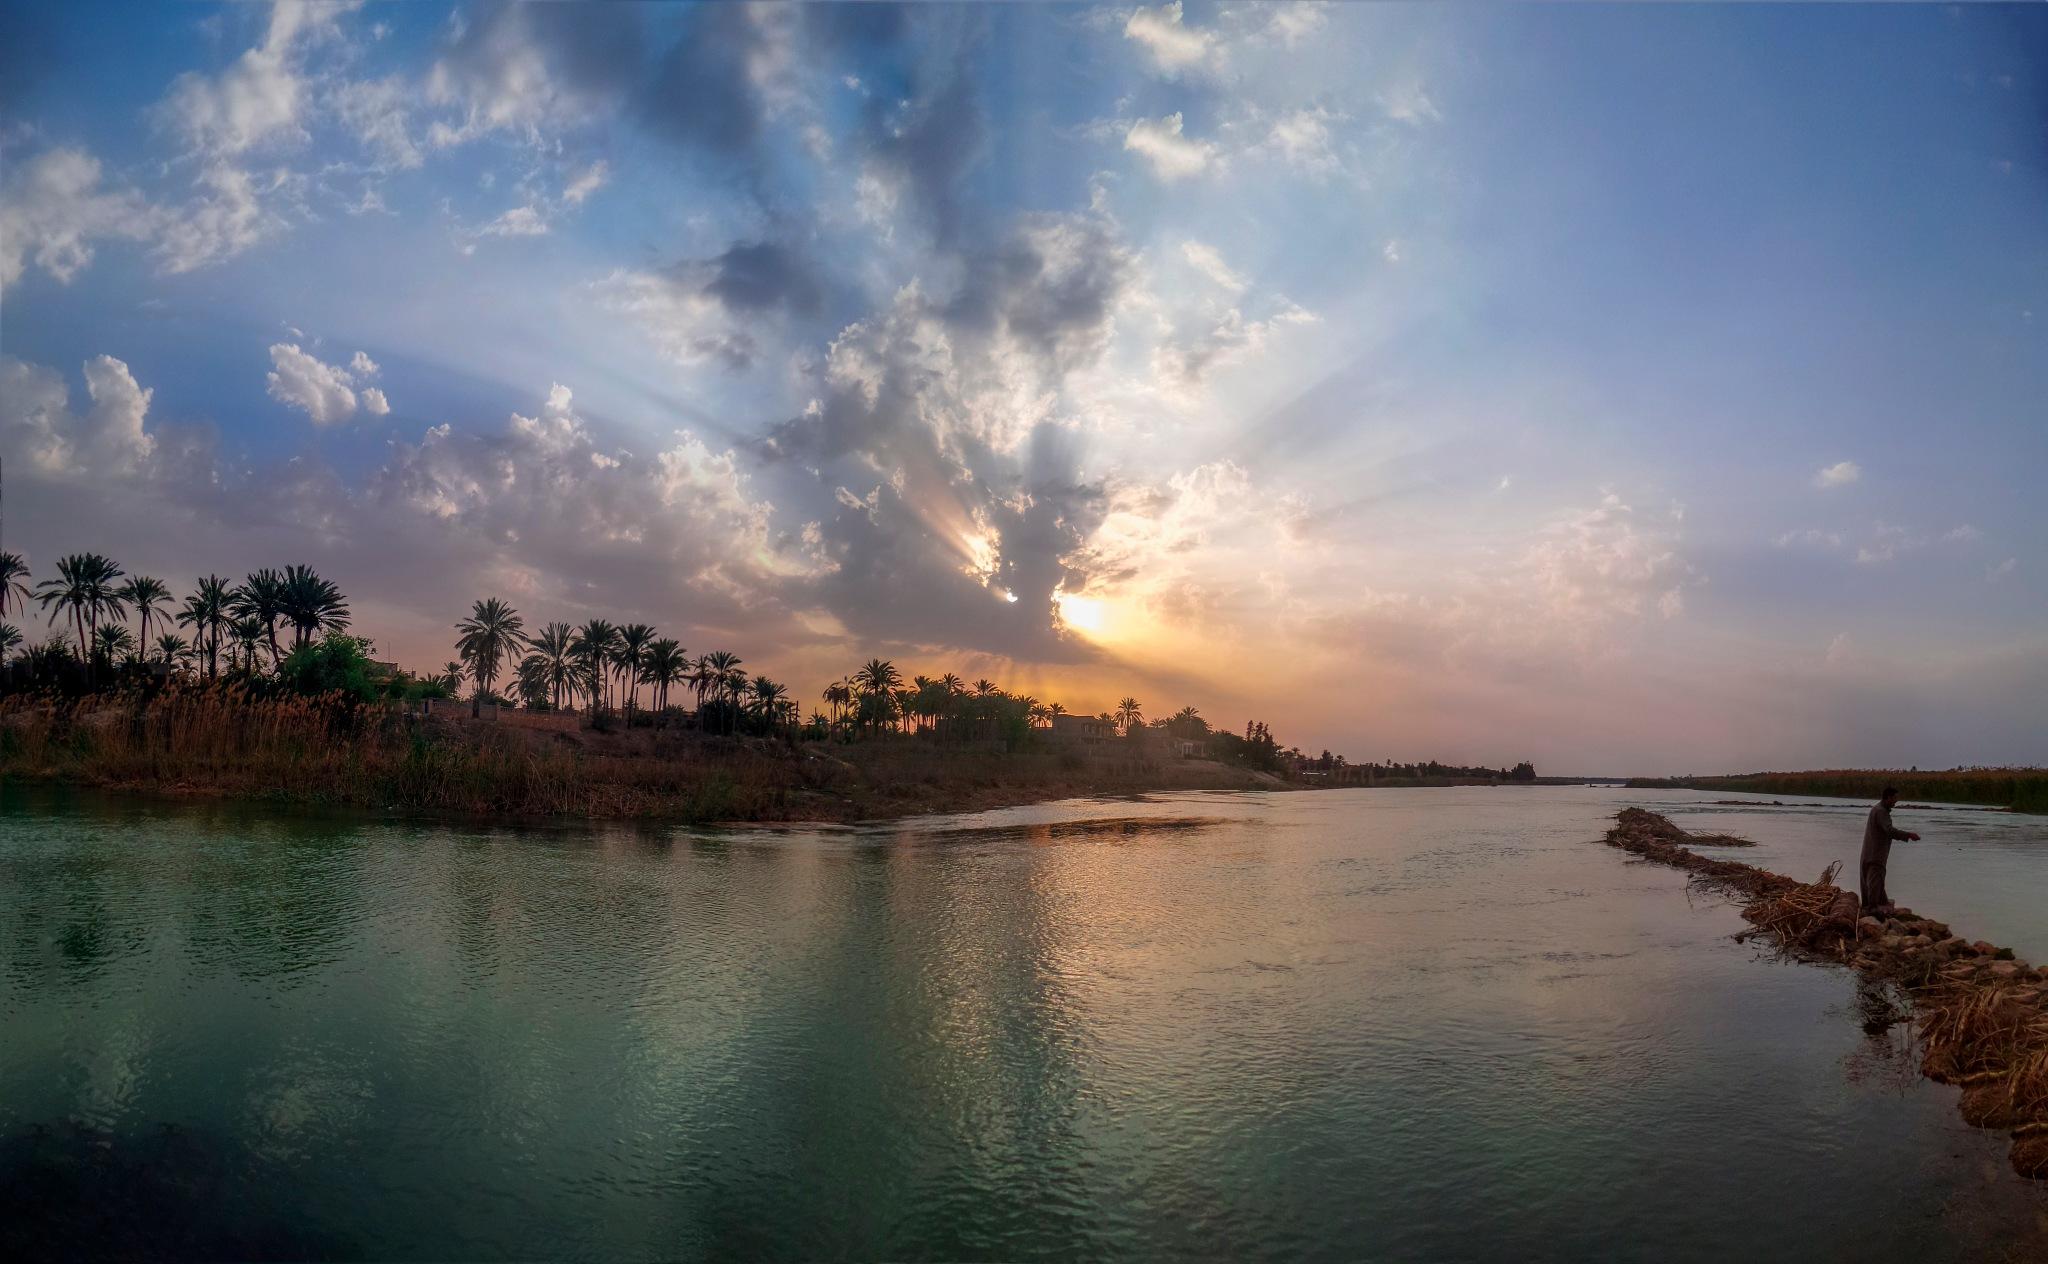 River of Eternity by Ammar SH Heety